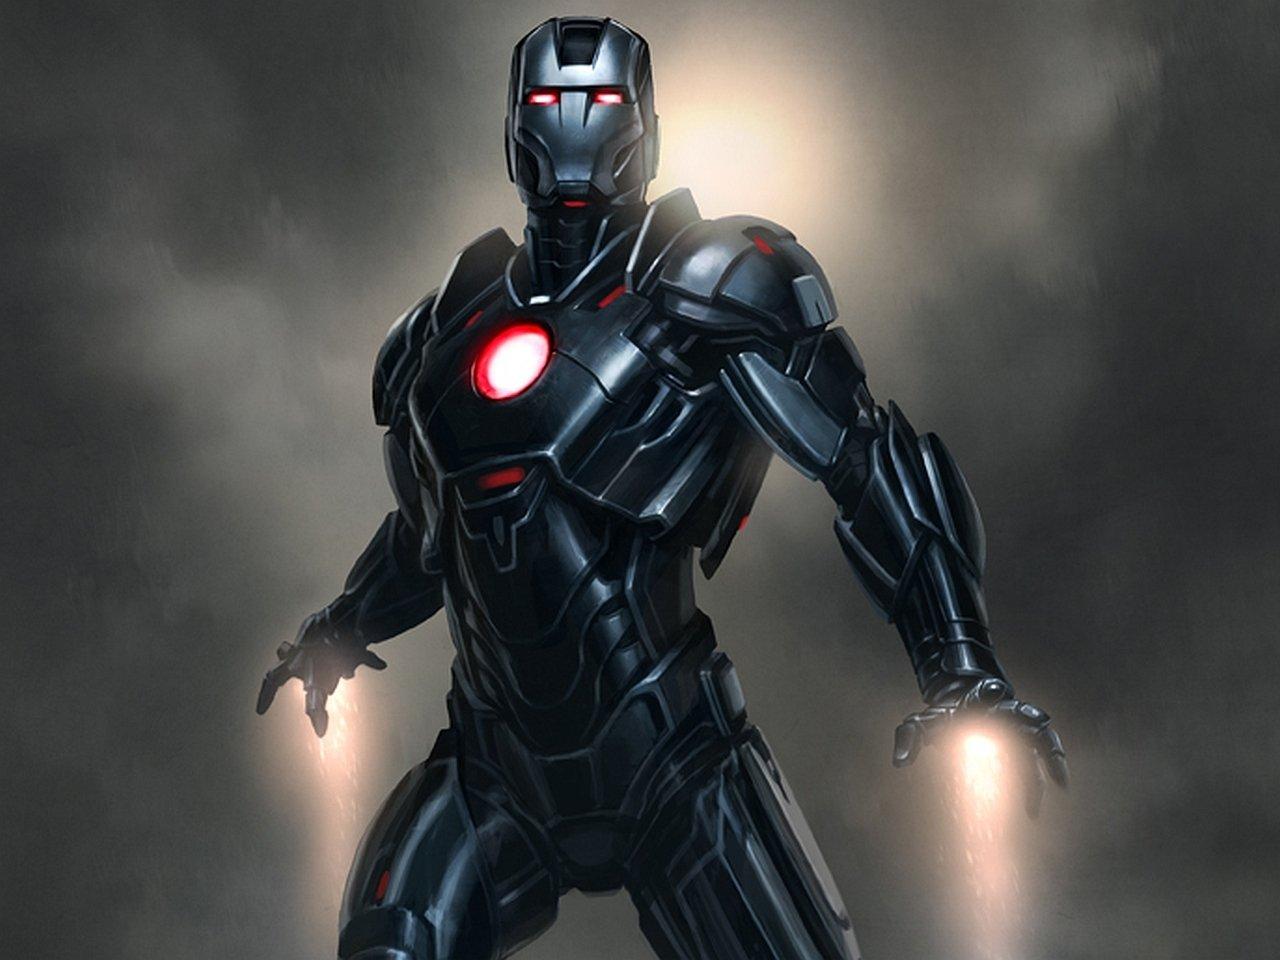 iron man hd wallpapers,superhero,fictional character,action figure,war machine,supervillain